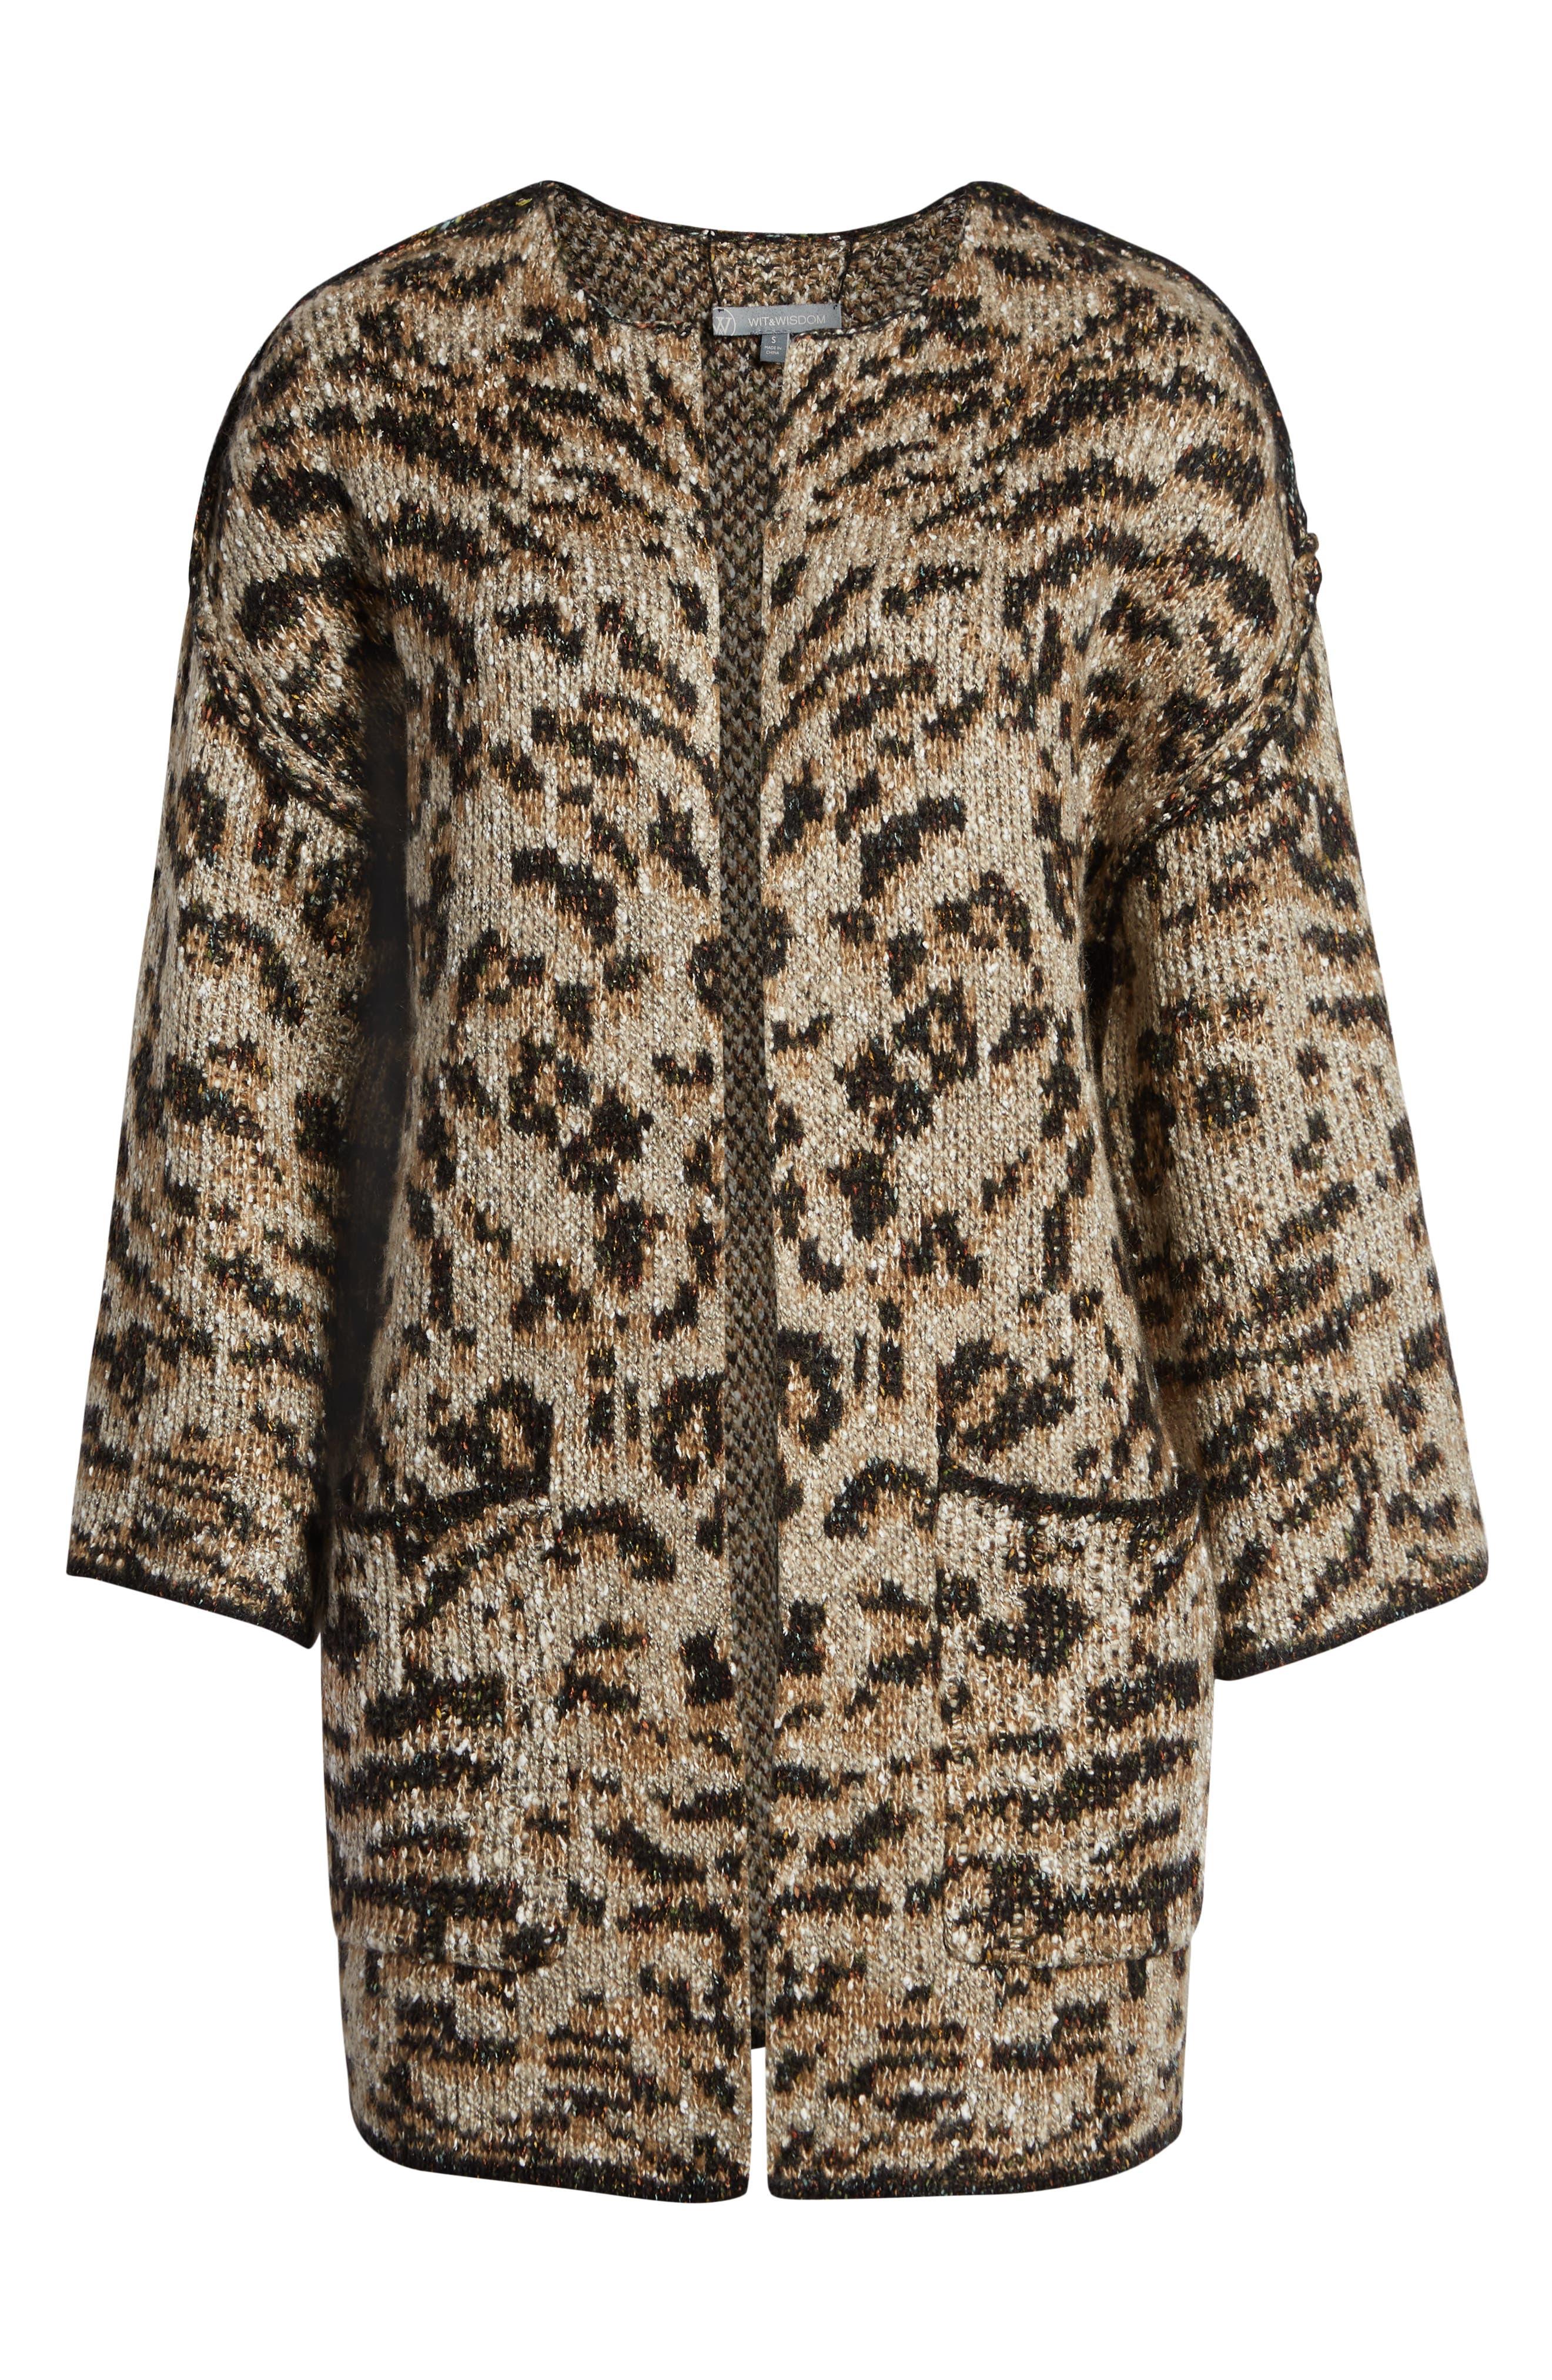 WIT & WISDOM,                             Reversible Tiger Jacquard Sweater Jacket,                             Alternate thumbnail 7, color,                             TAUPE